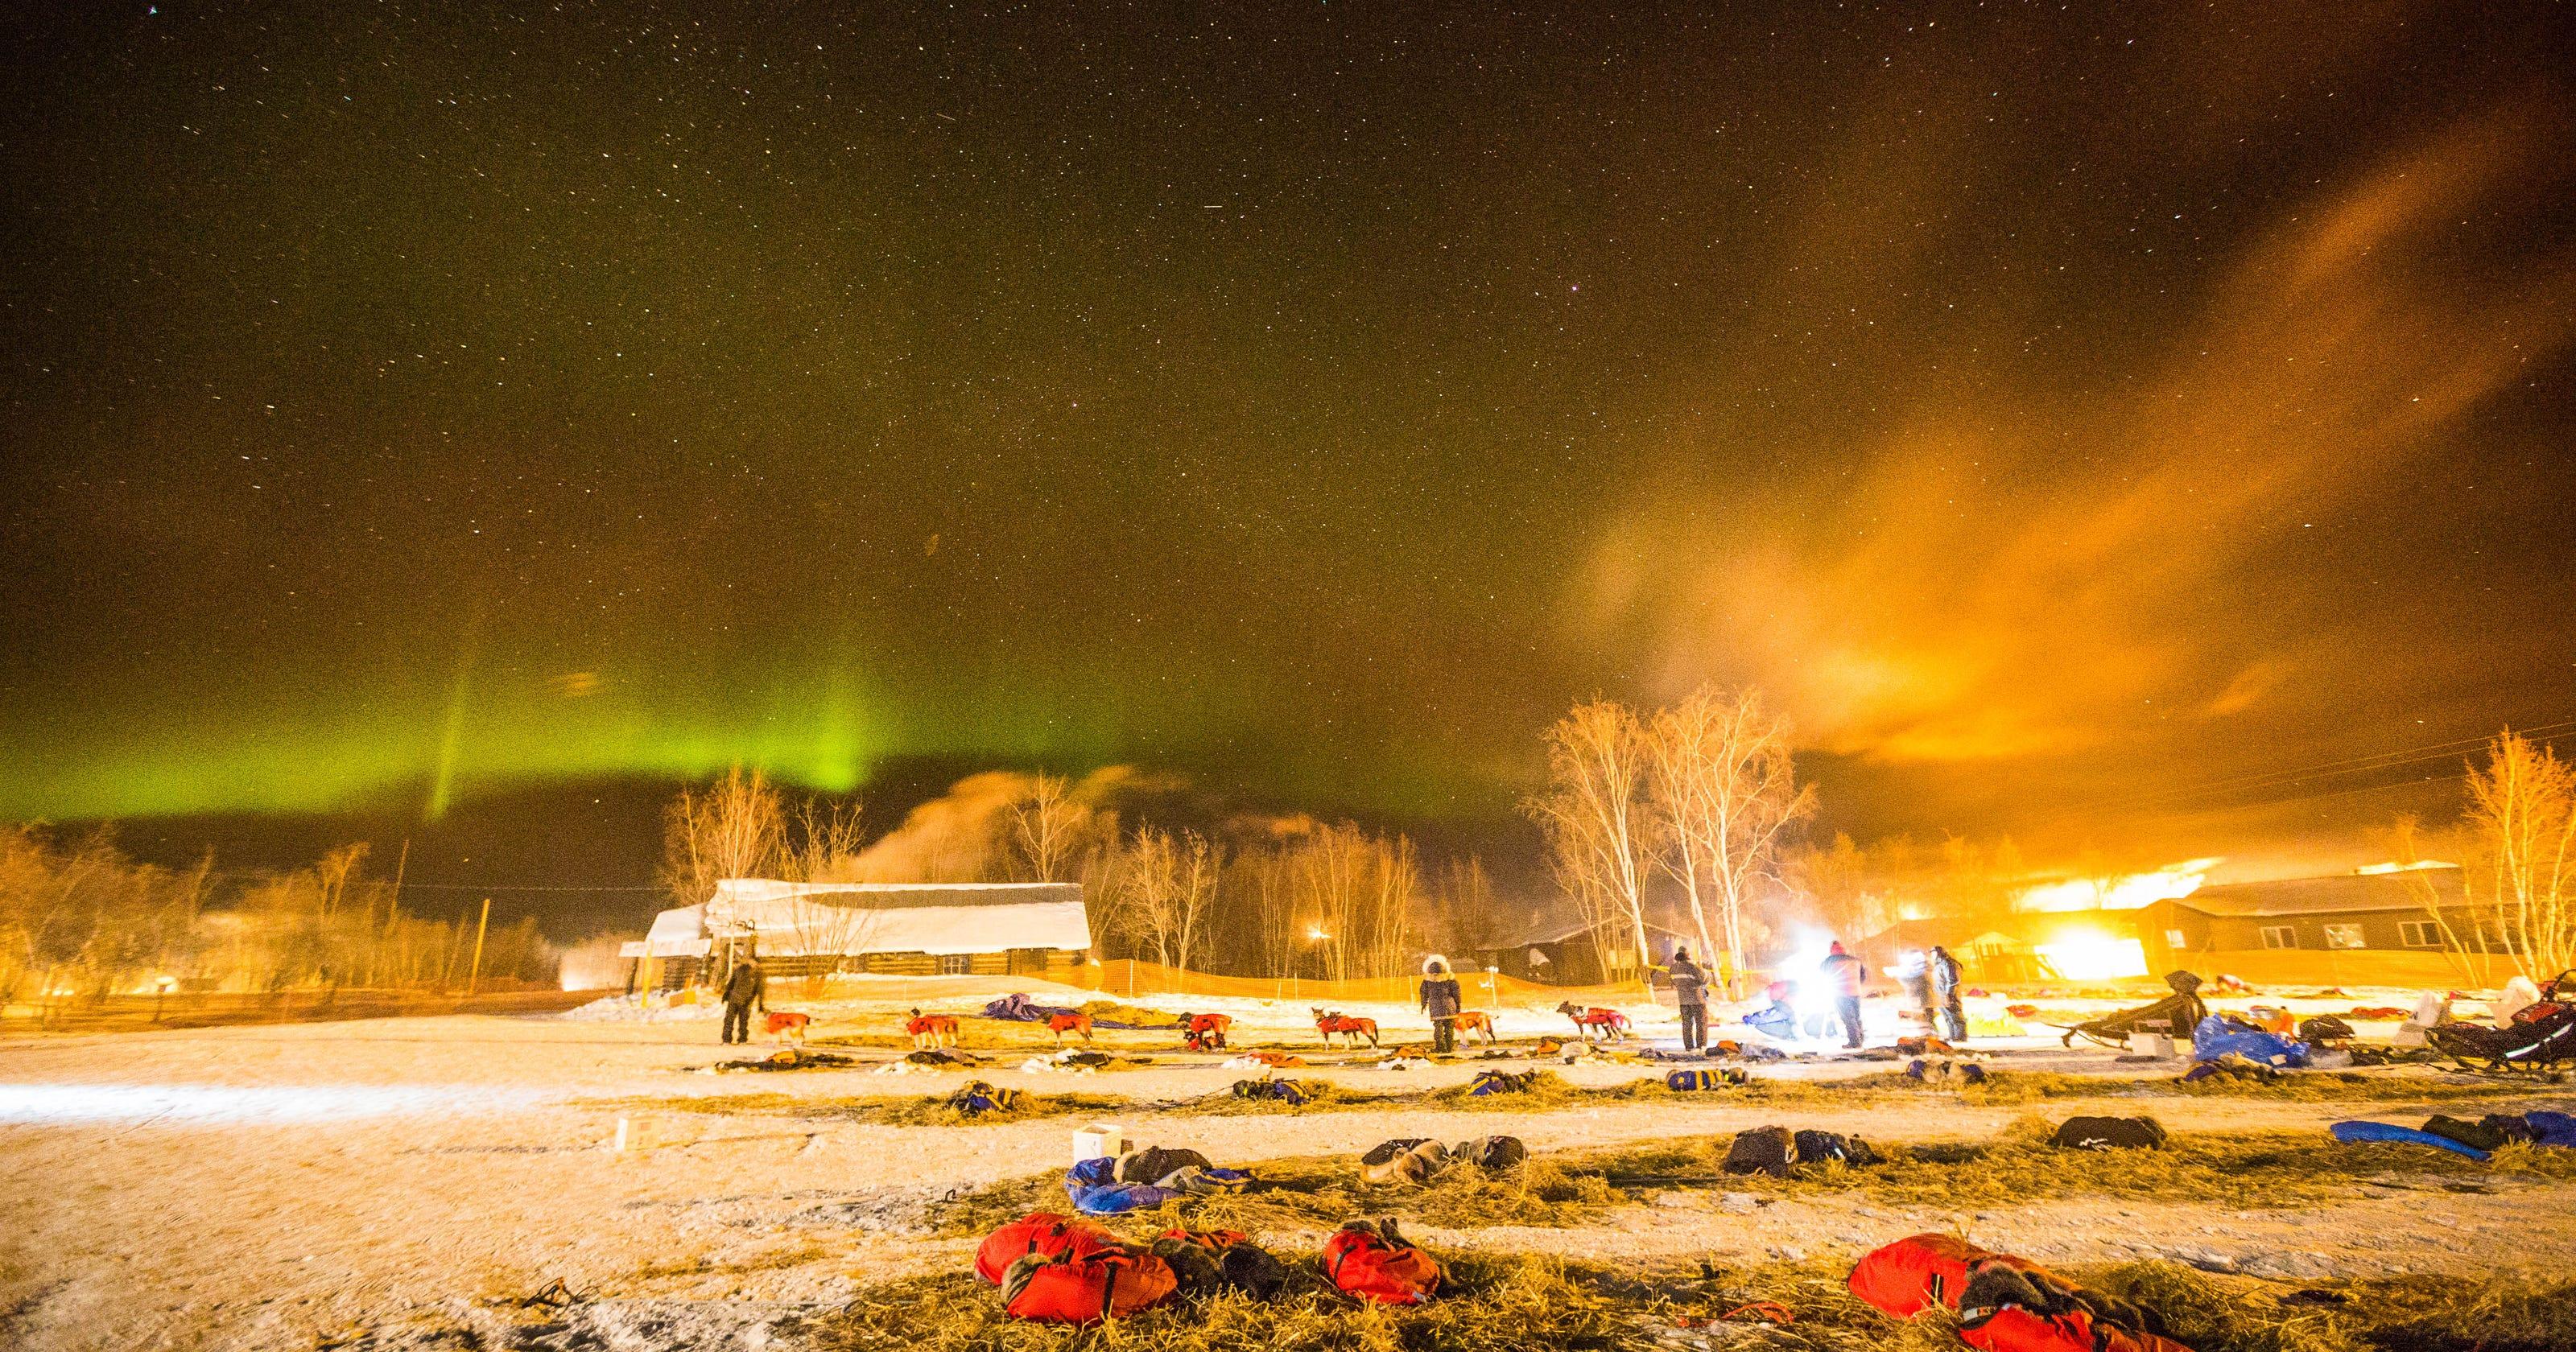 solar storm facebook - photo #15